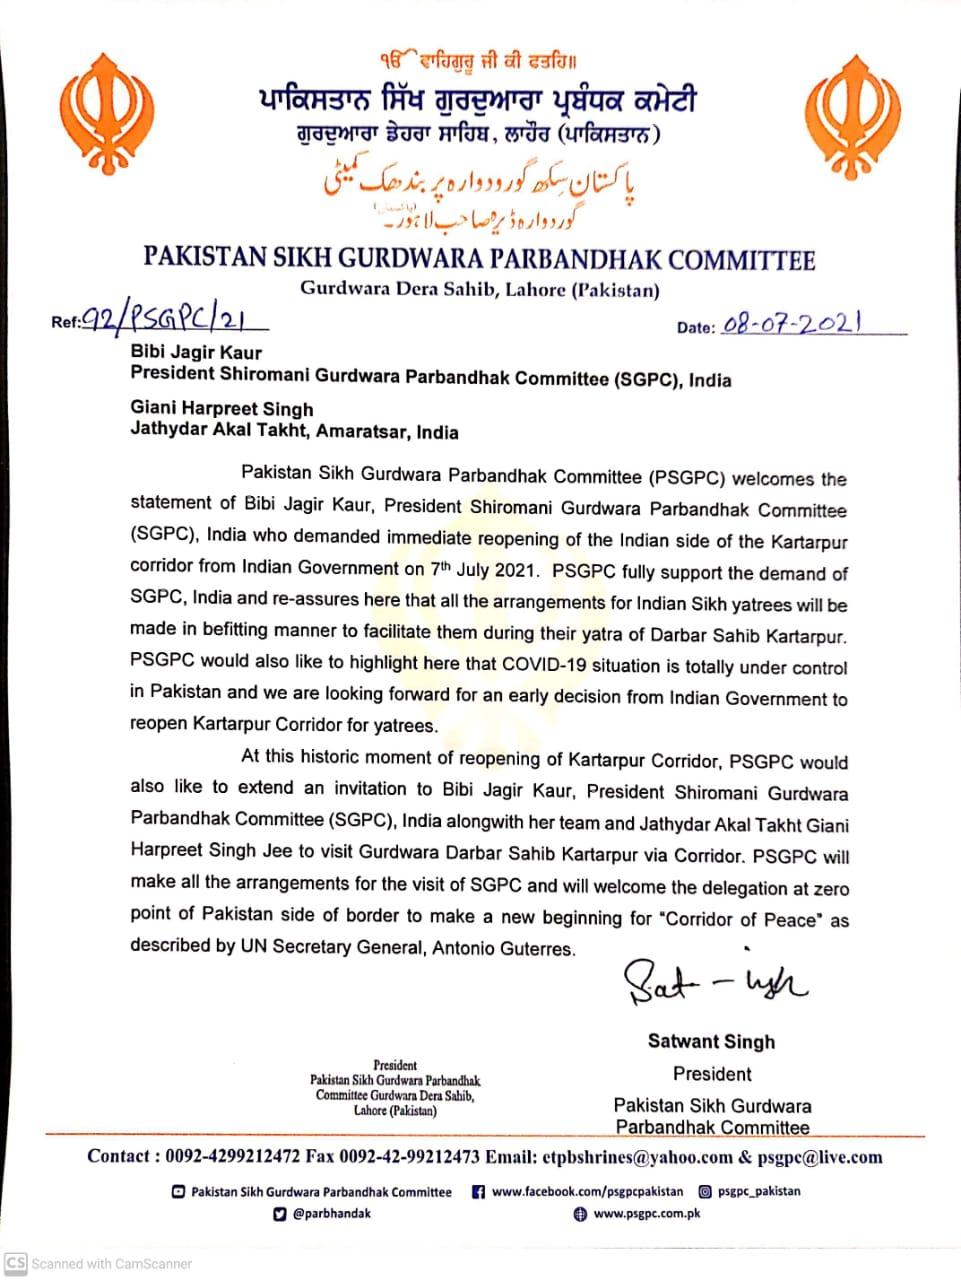 PSGPC welcomes Bibi Jagir Kaur